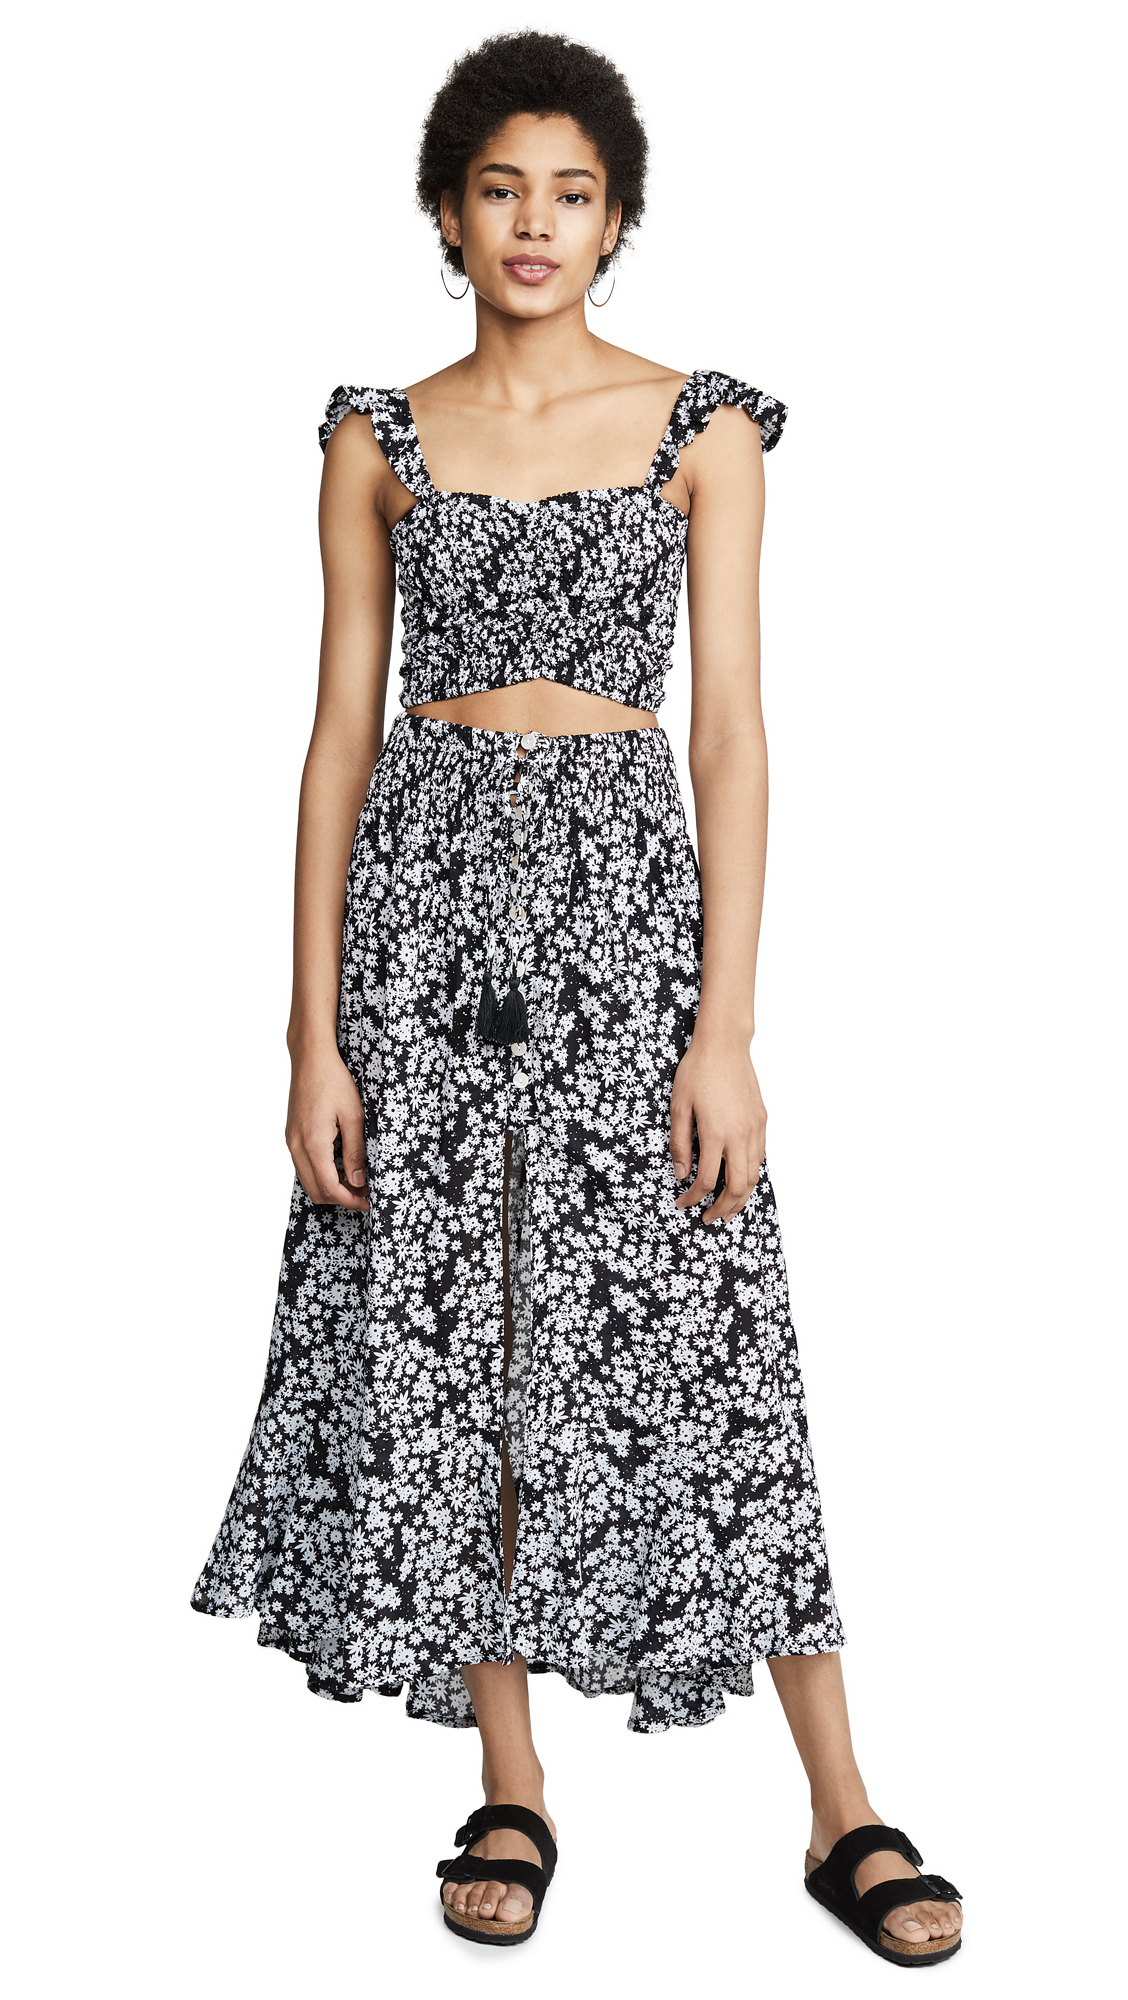 c947609478 Tiare Hawaii Hollie Top & Dakota Skirt Set In Scattered Daisy Black/White